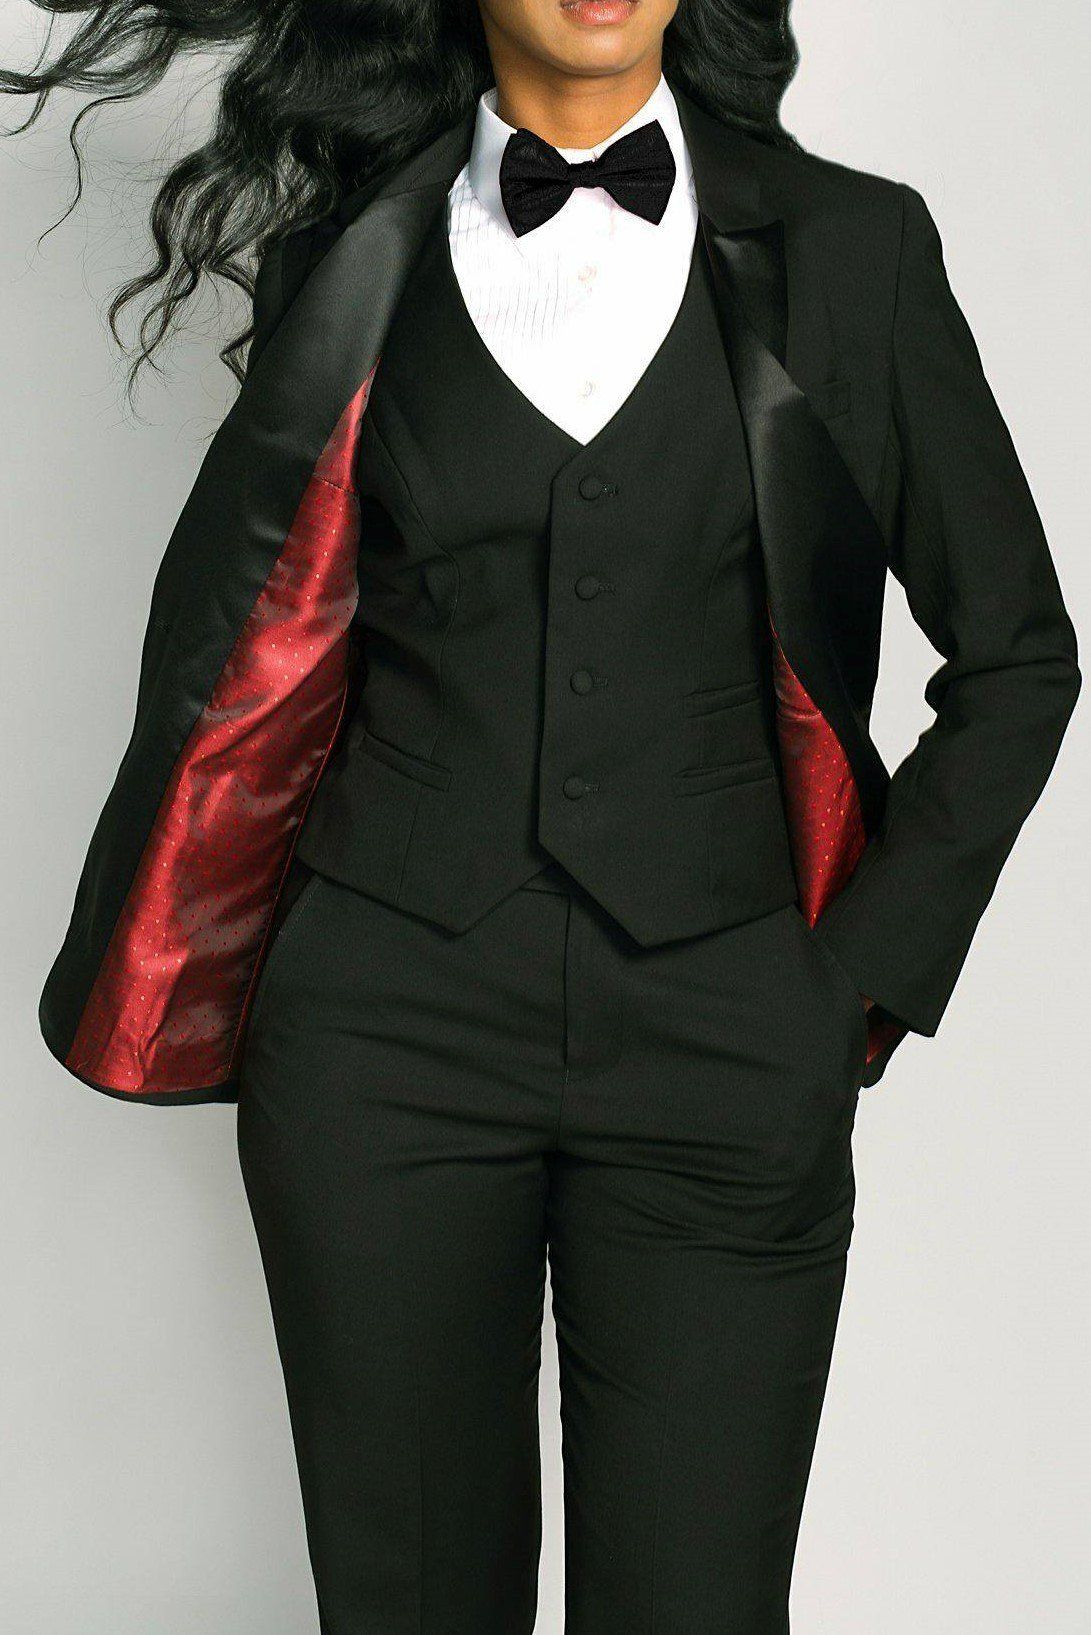 Classic Limited Edition Black Short Peak Lapel Red Lining Tuxedo ... b132c9cebd